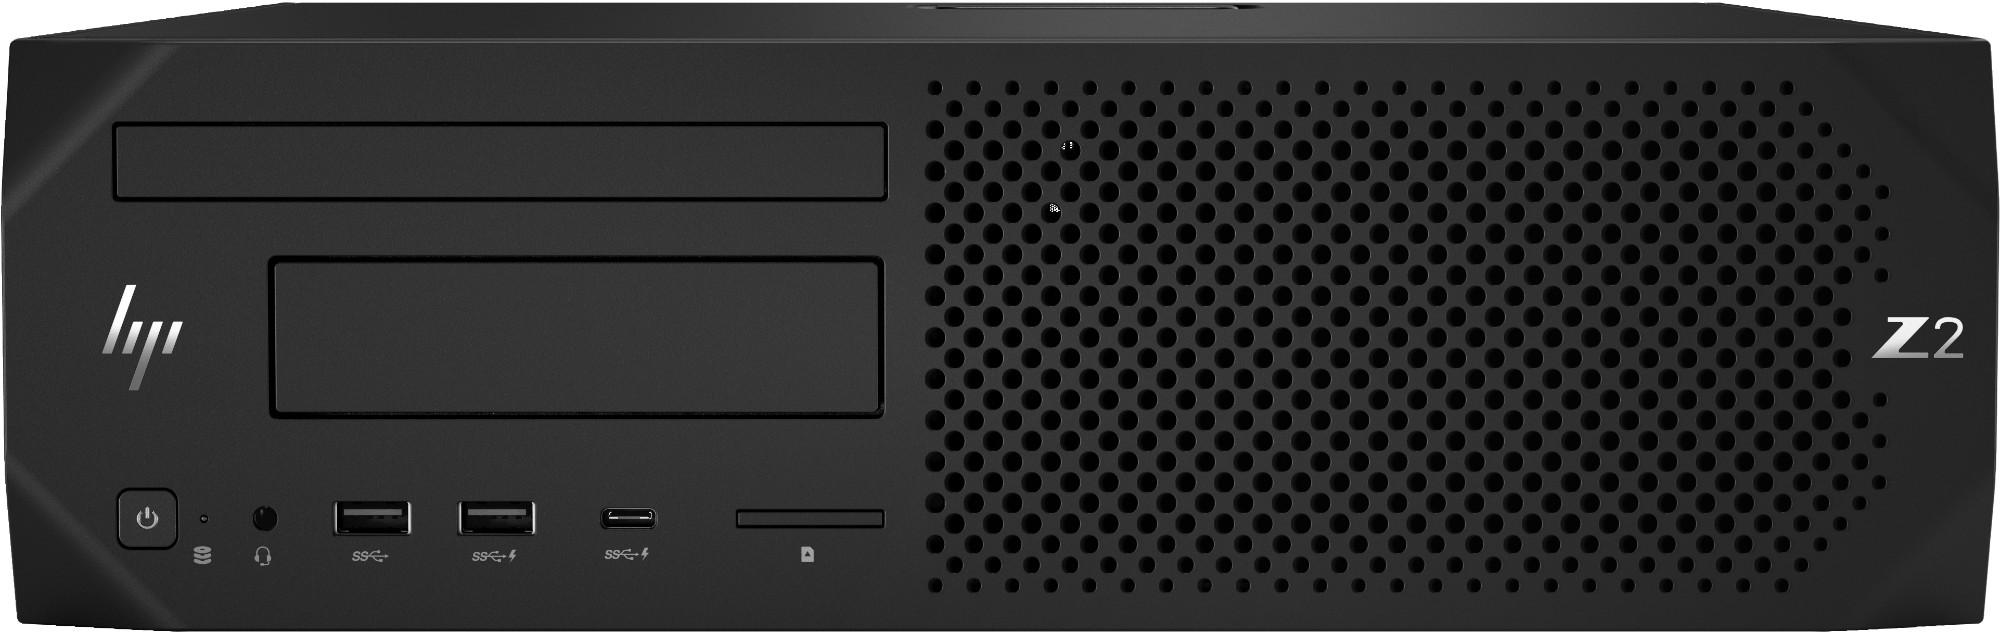 Workstation Z2 G4 SFF - i7 8700 - 8GB RAM - 1TB HDD - Win10 Pro